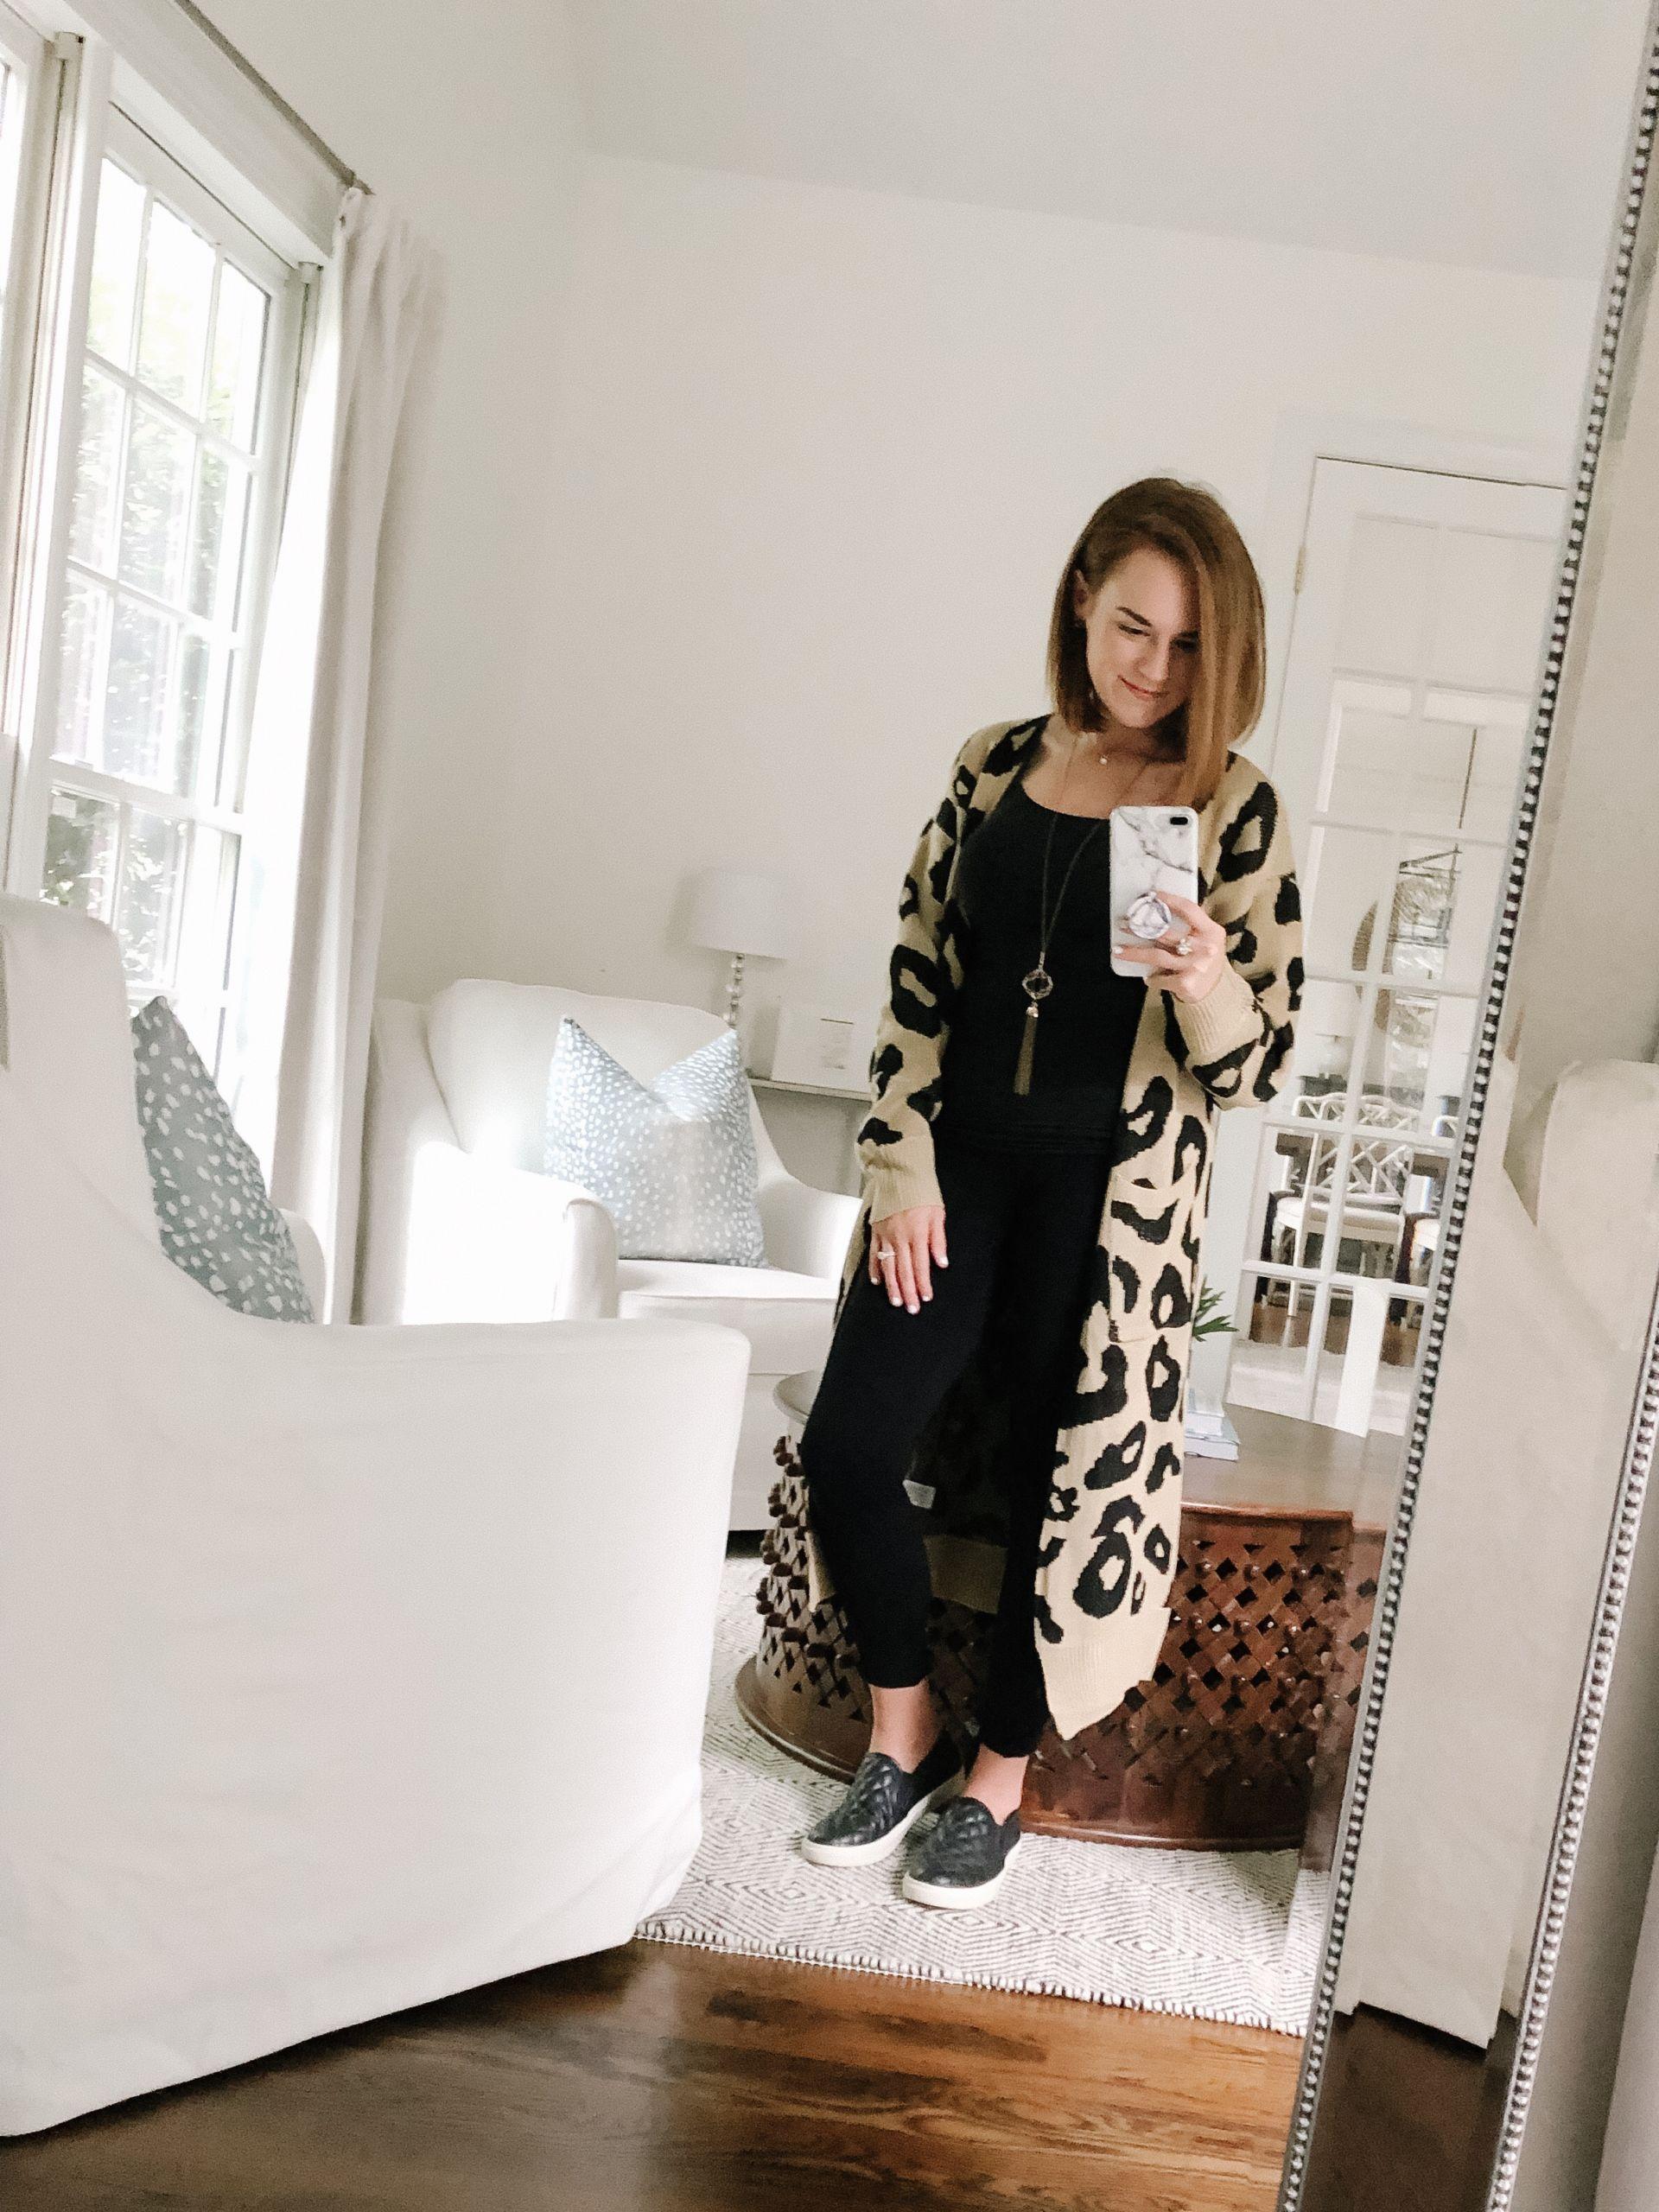 9a5bf97bc2d0a Amazon Fashion Finds | August - Carolina Charm